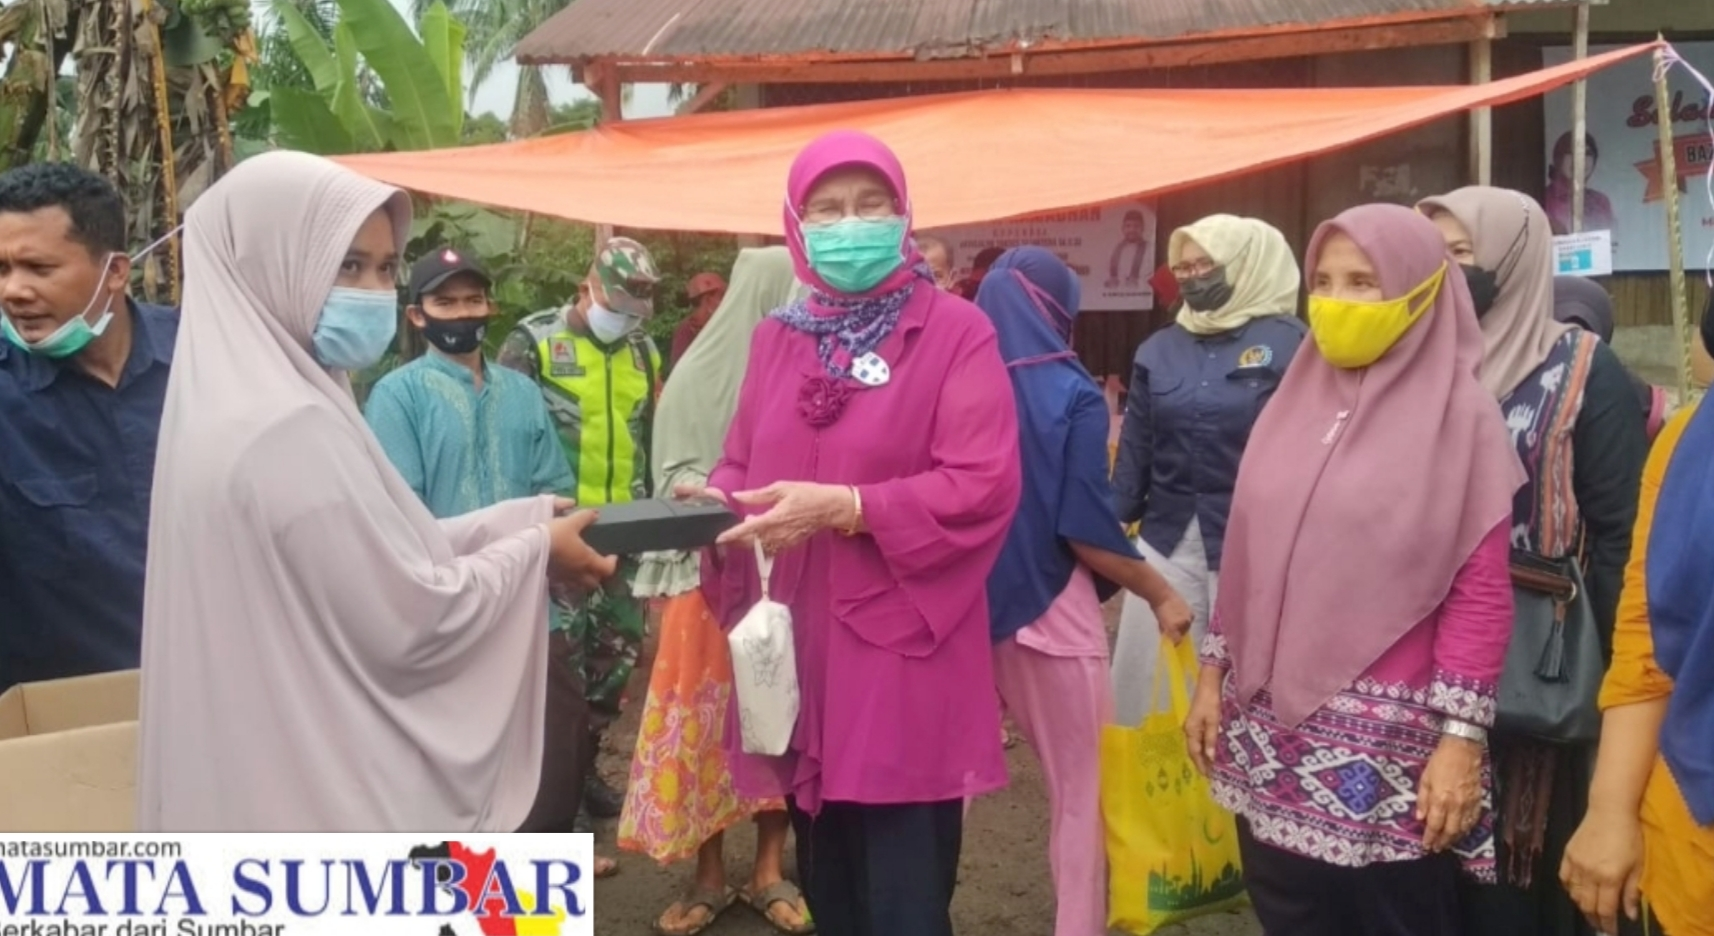 Bazar Murah di Pasbar, Harga Sembako Sebagian di Subsidi Anggota DPD RI